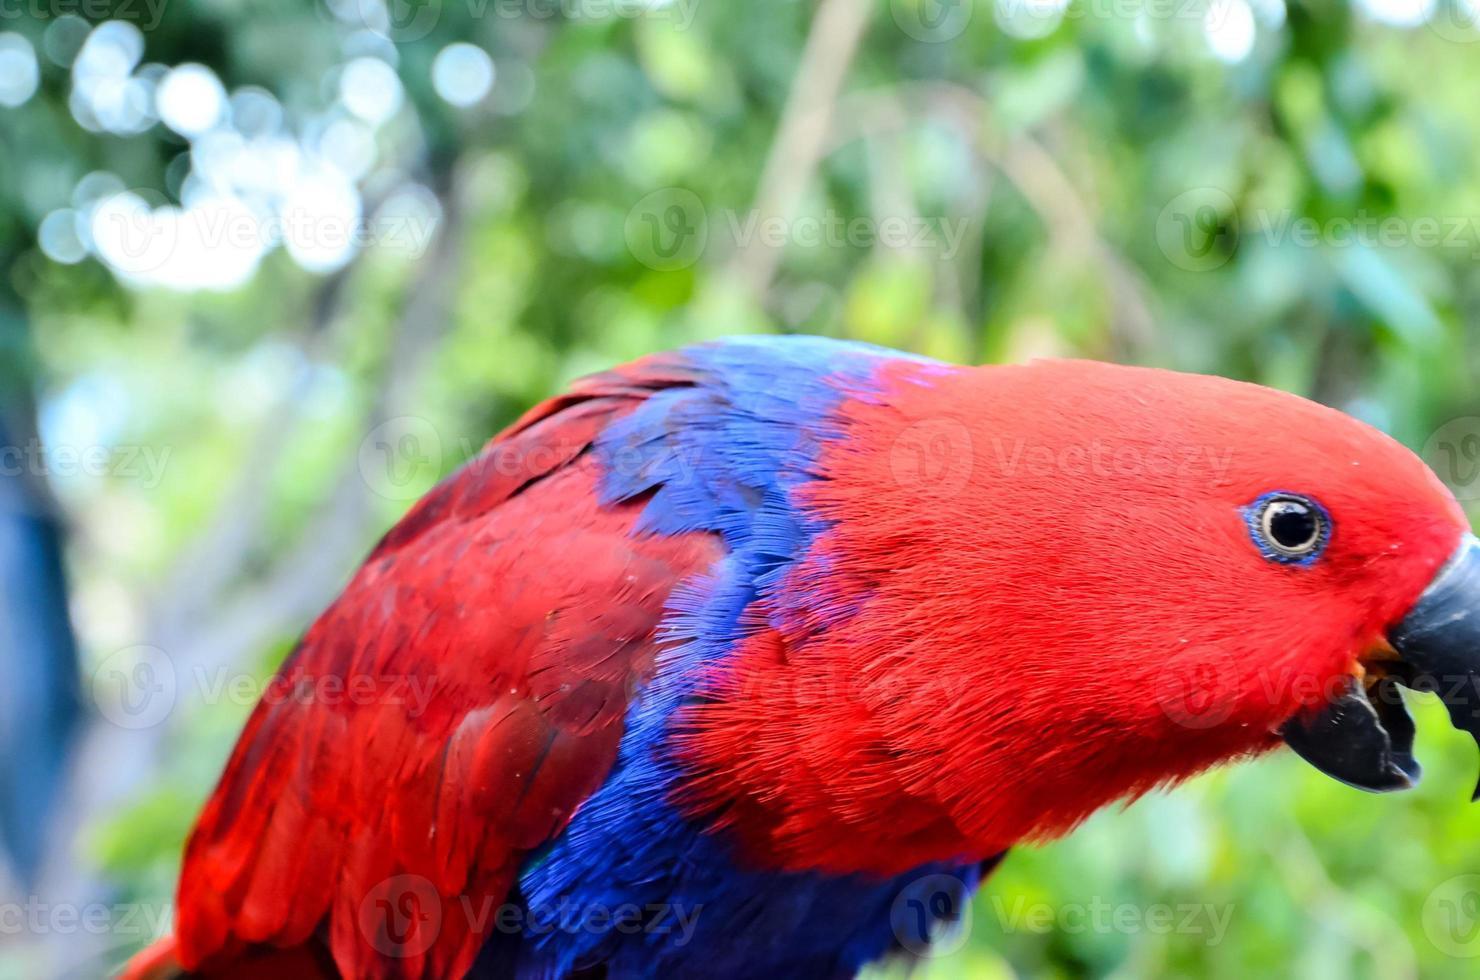 Parrot Tropical Bird photo